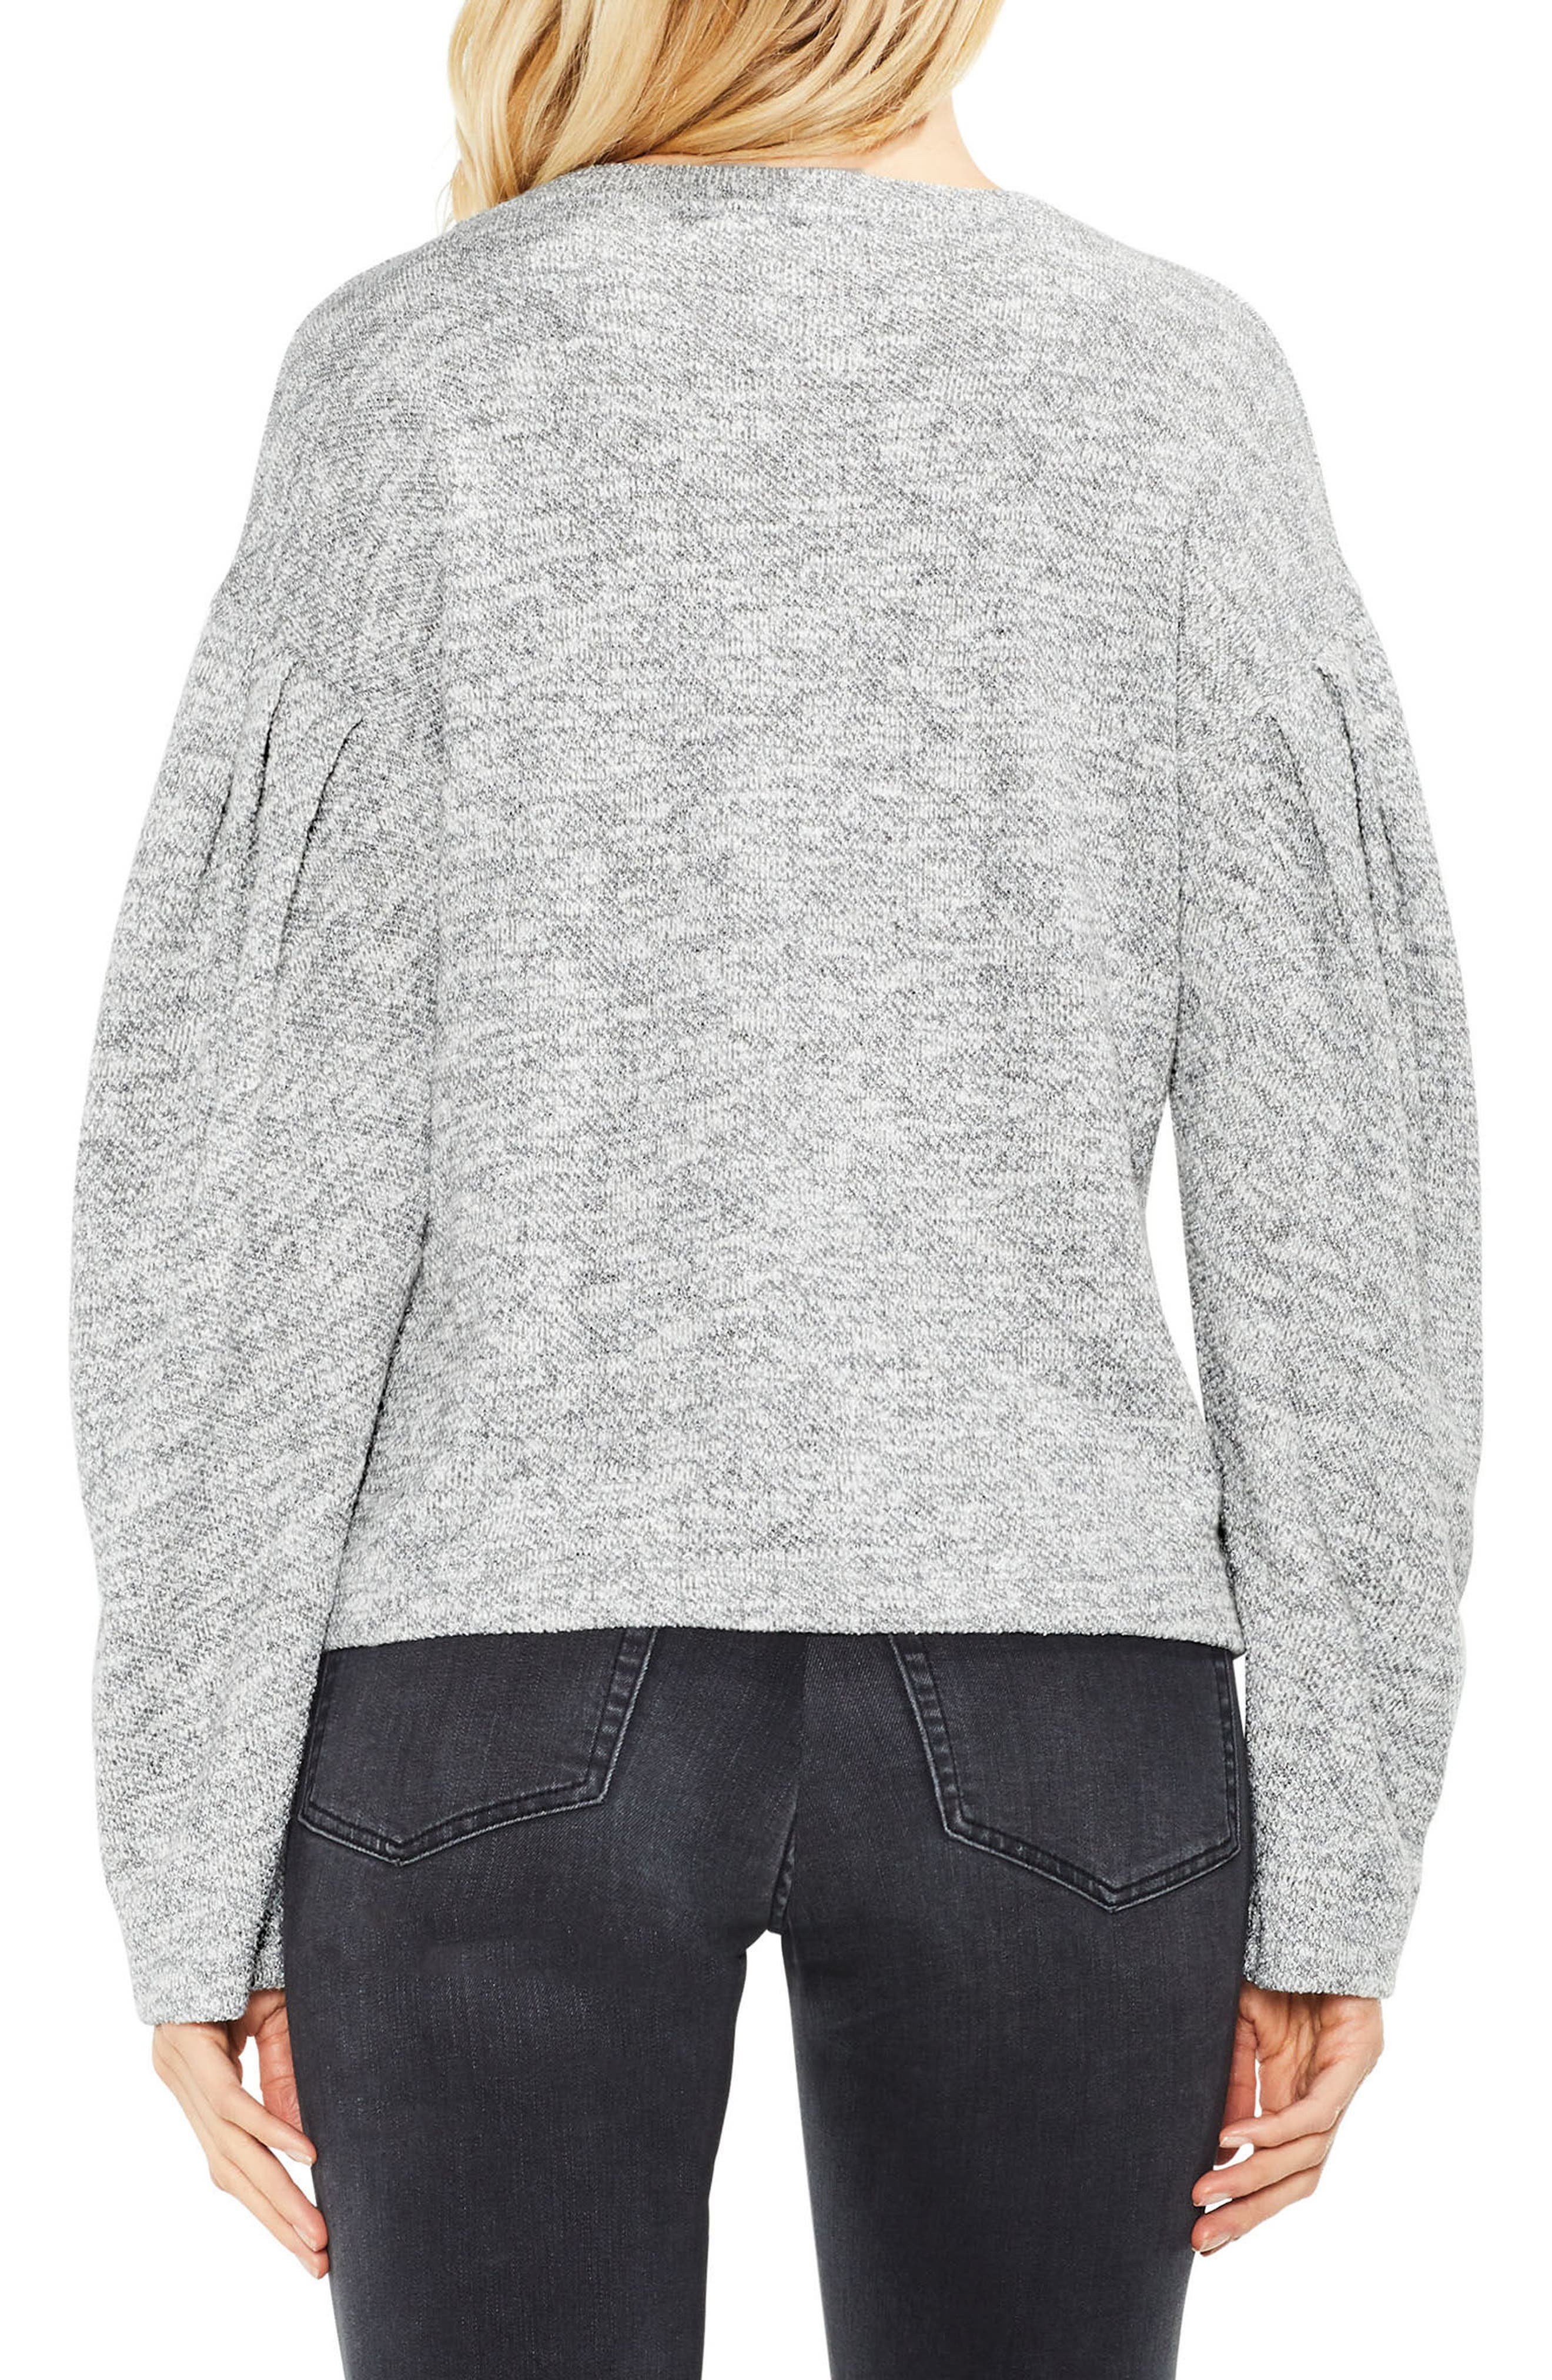 Metallic Knit Sweater,                             Alternate thumbnail 2, color,                             Grey Heather